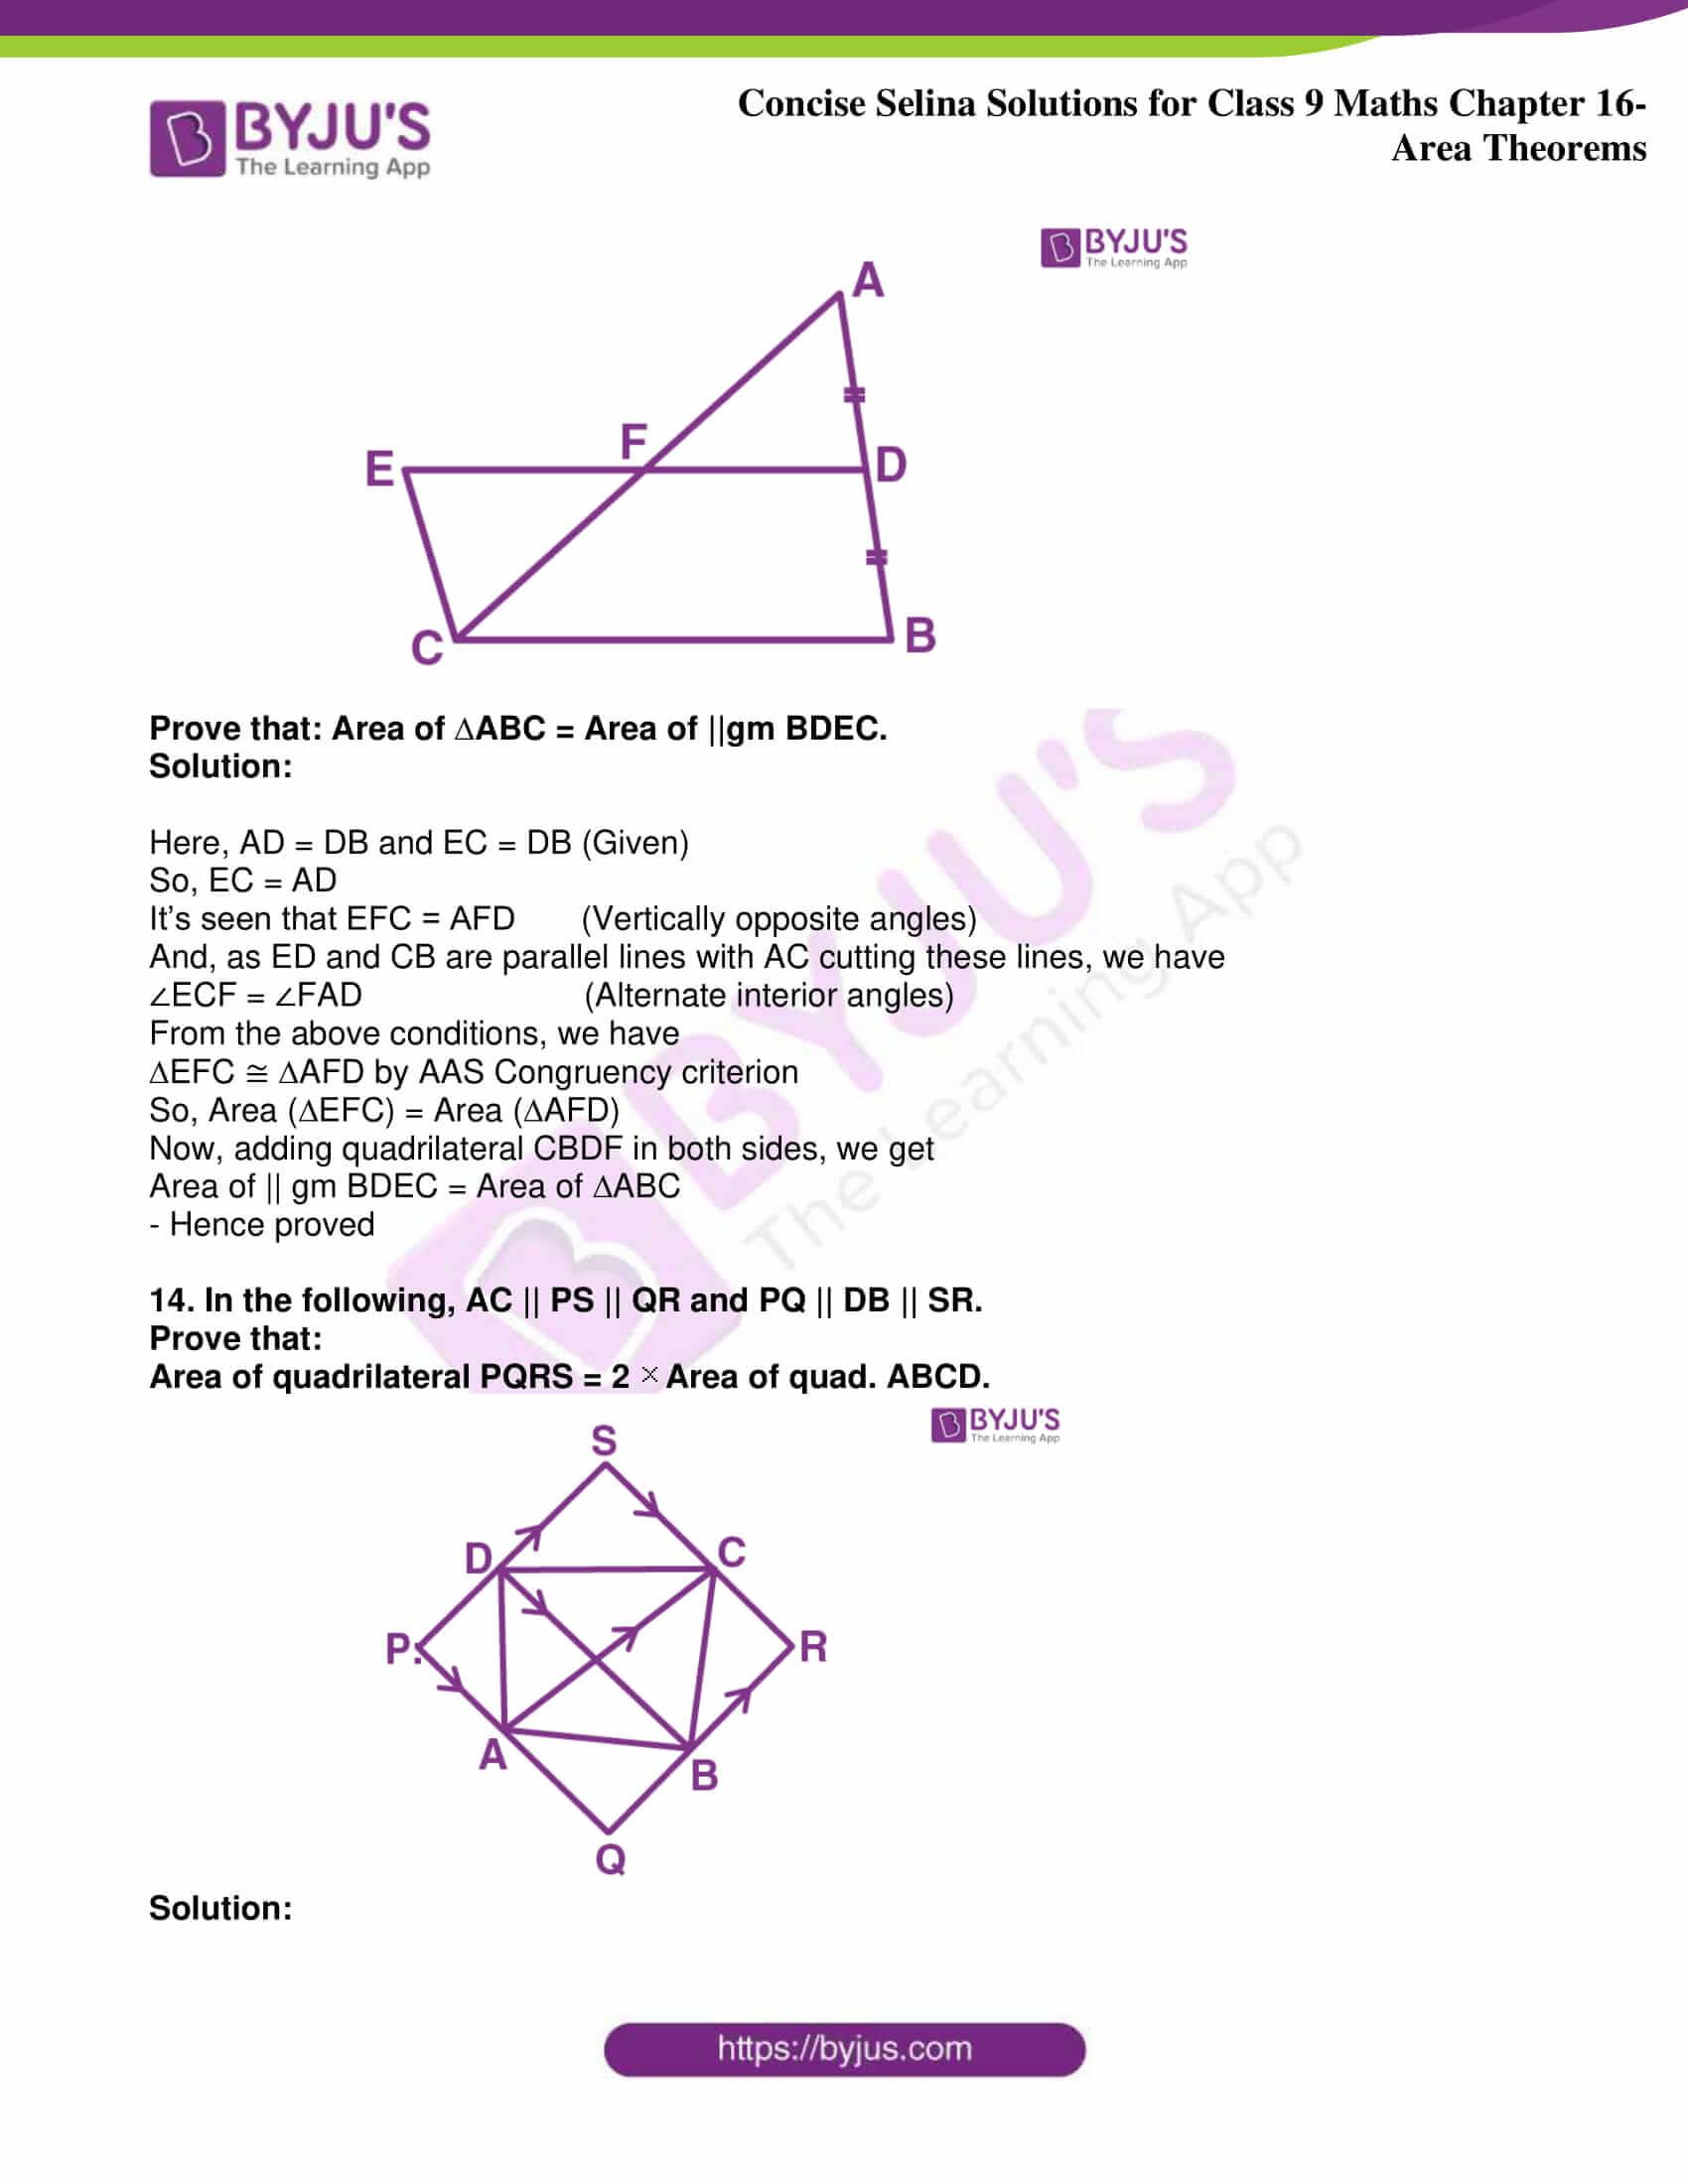 icse class 9 jun9 maths selina solutions chapter 16 area theorems 12